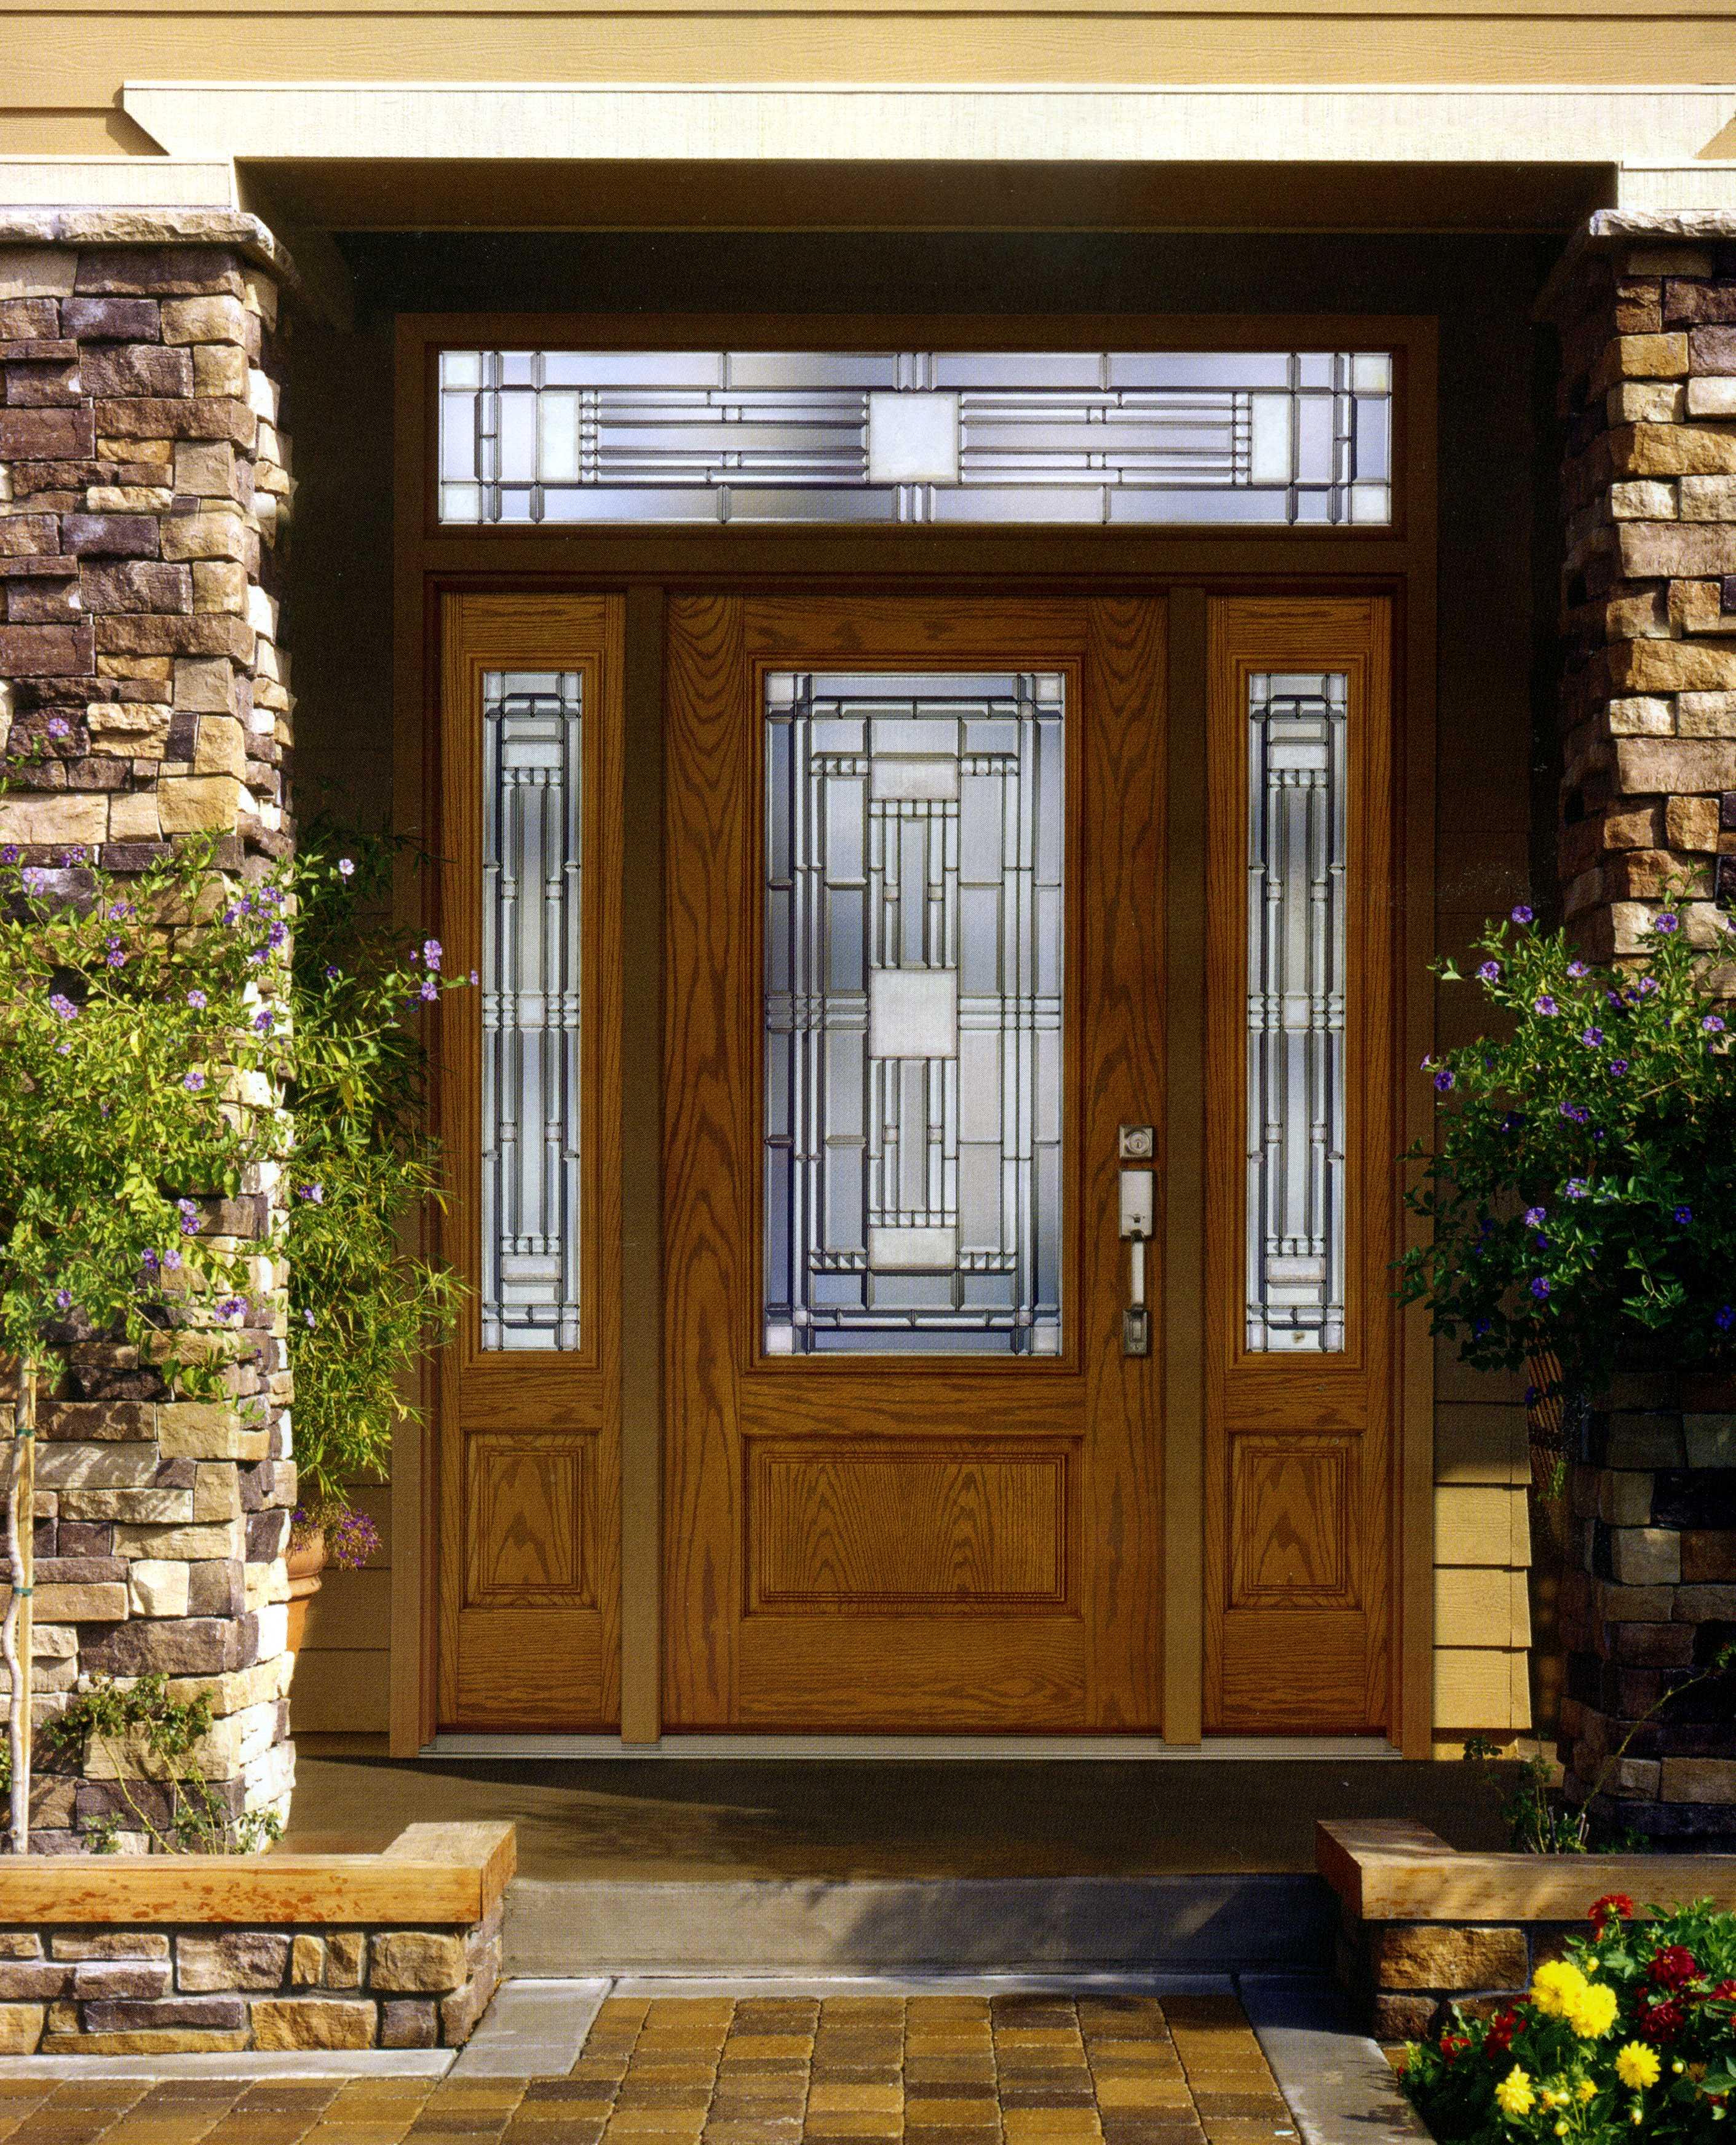 25 Inspiring Door Design Ideas For Your Home,Pinterest Home Wedding Decoration